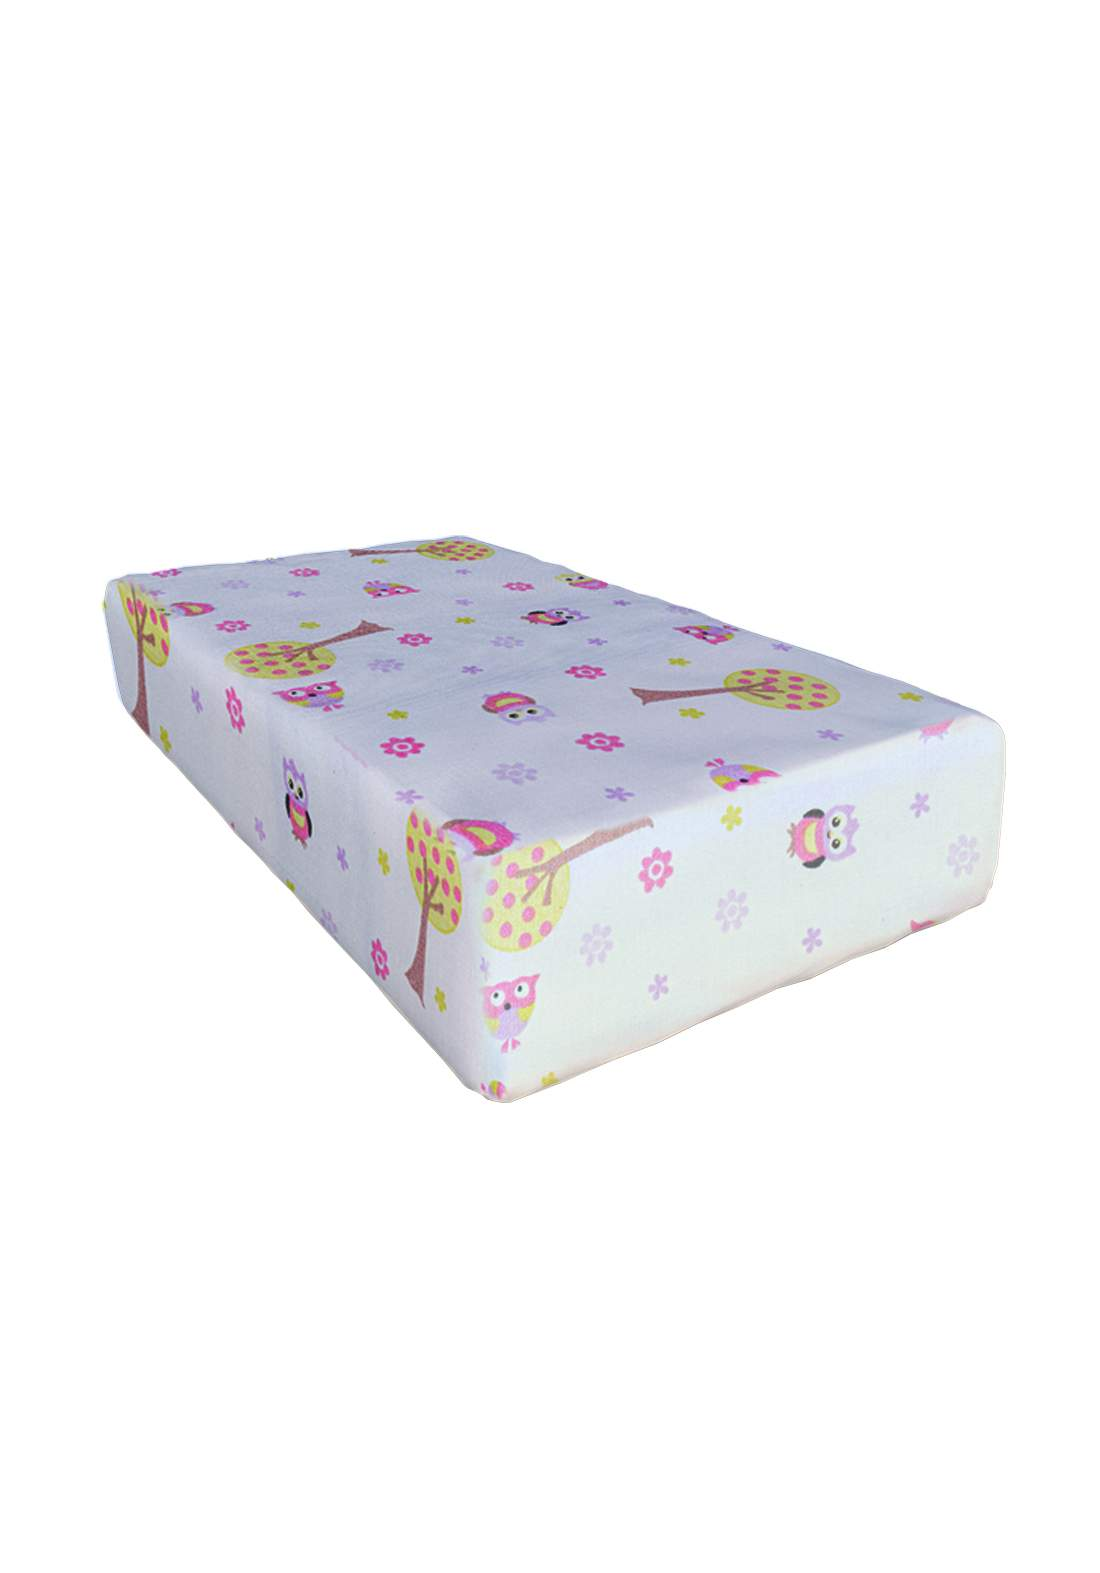 KD Group Elastic Bed Sheet شرشف سرير للأطفال